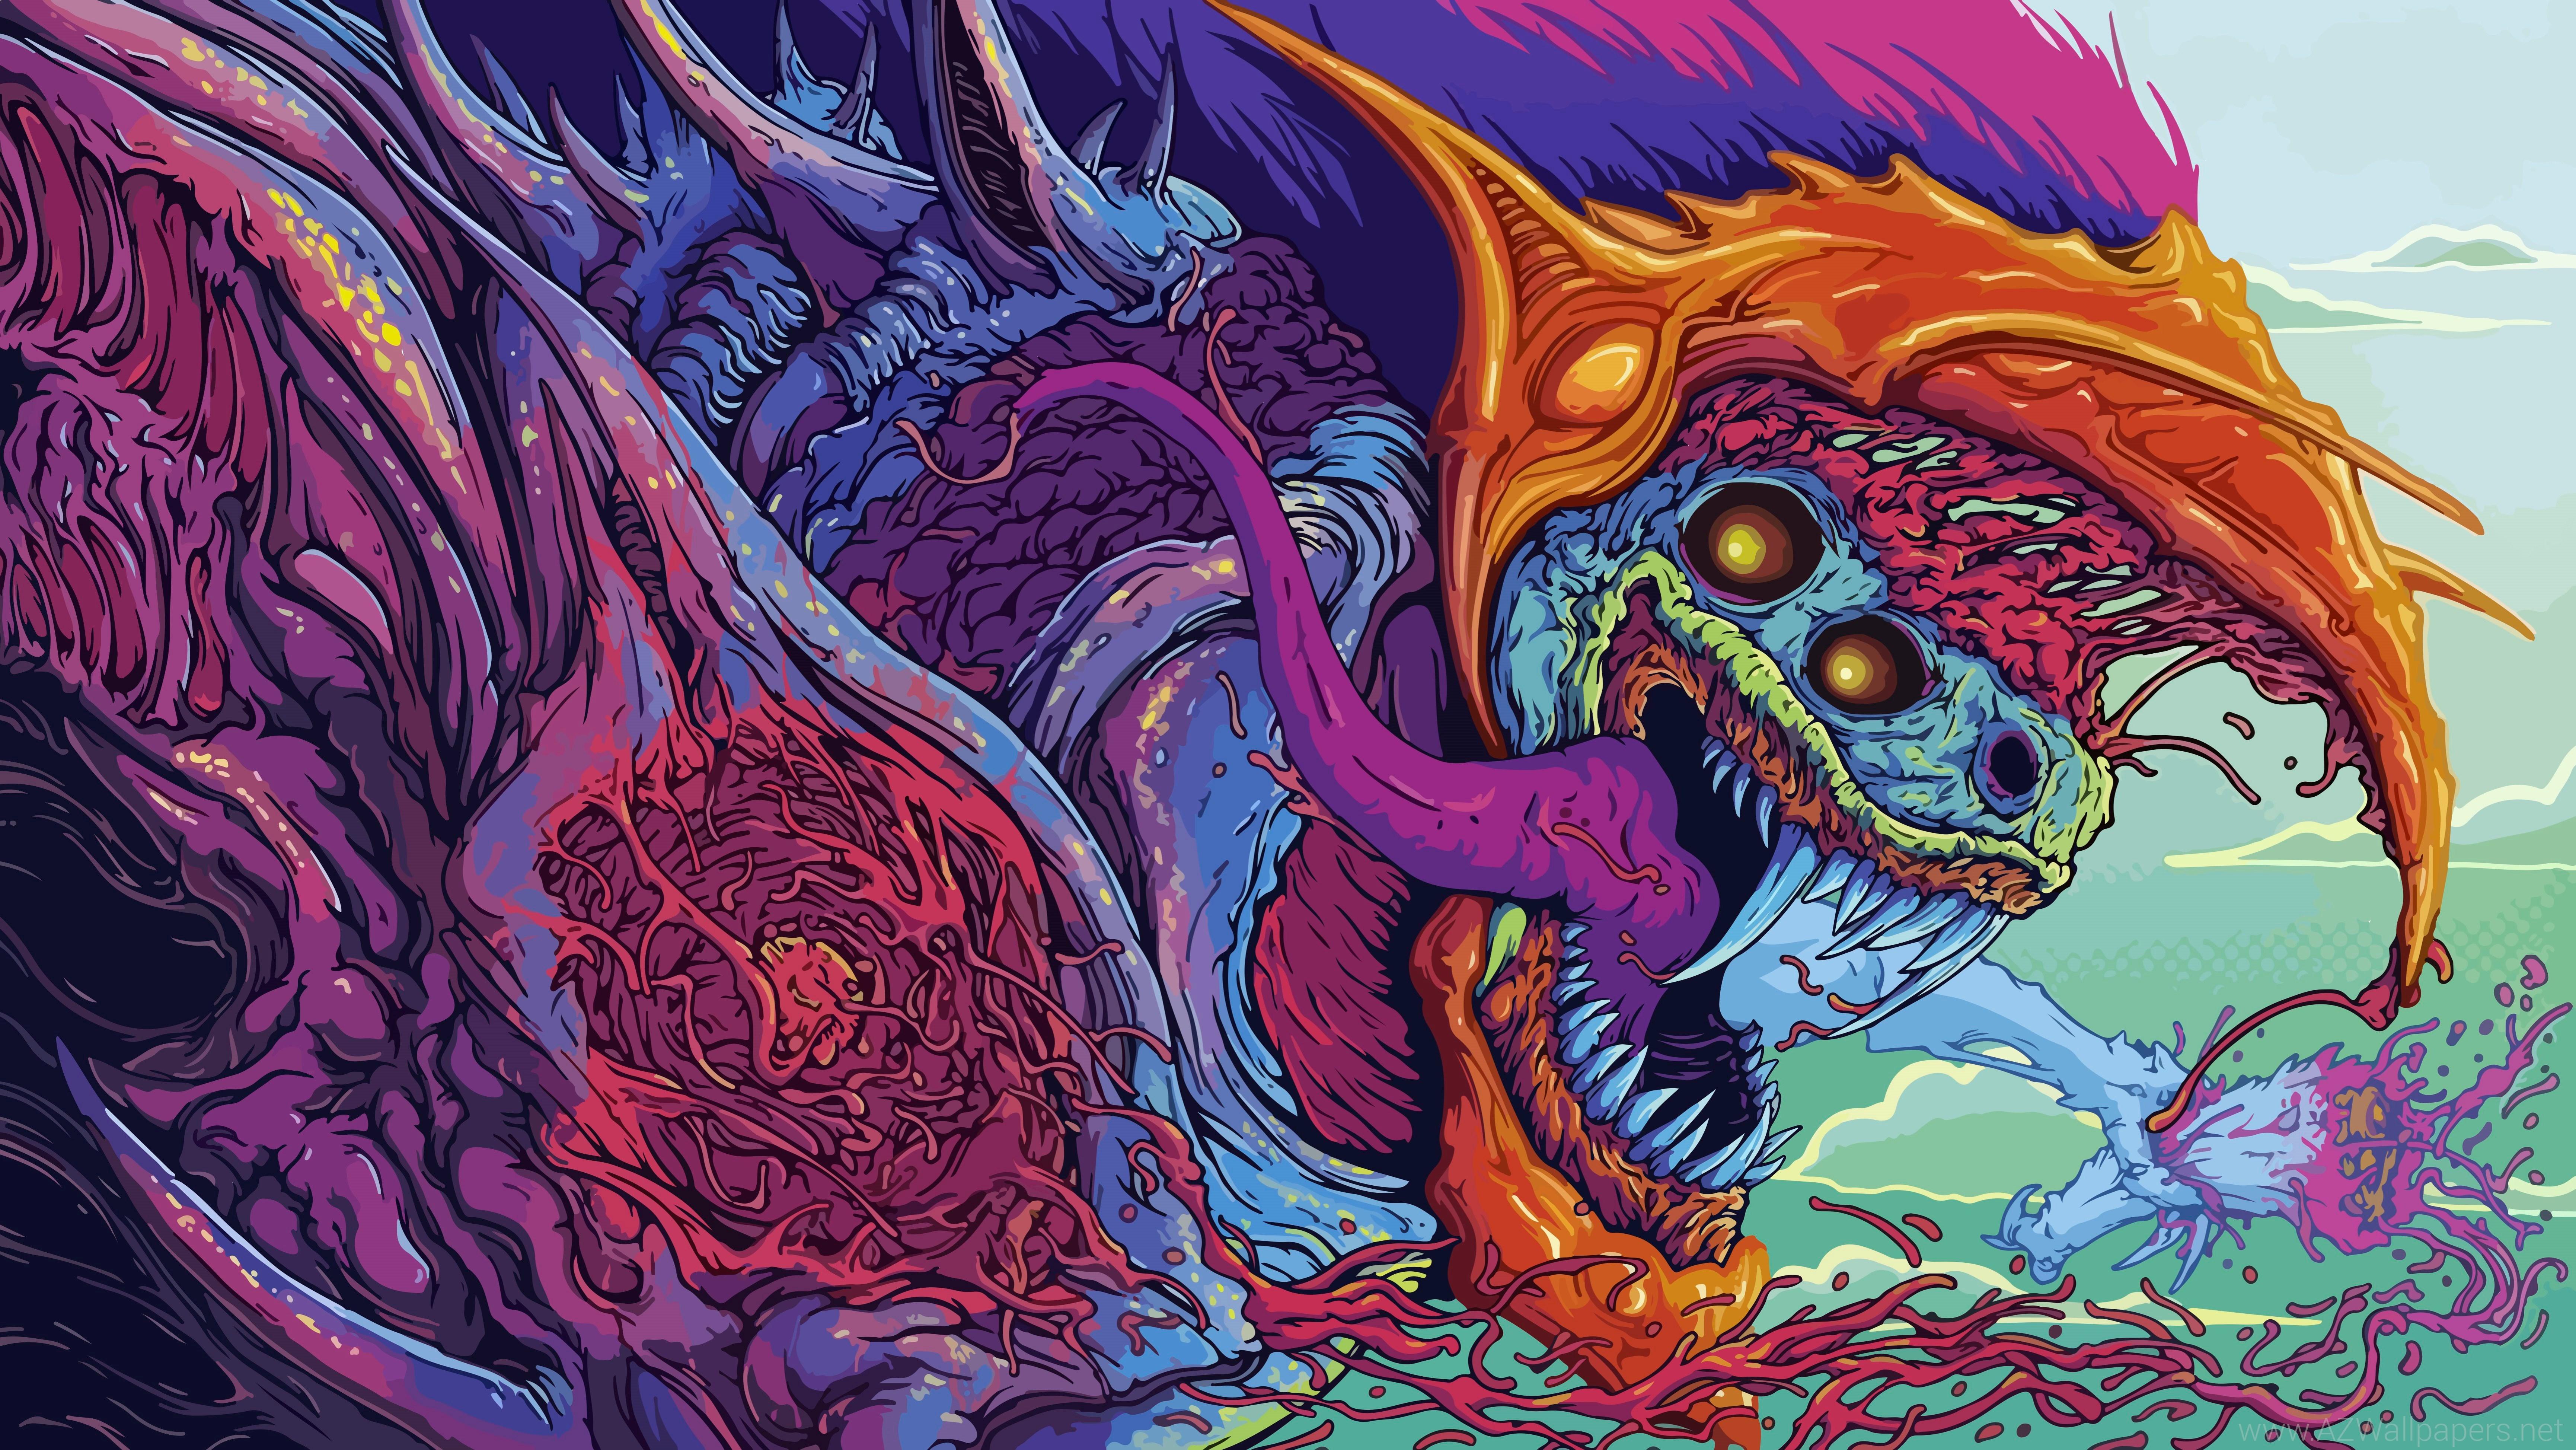 full hd pc wallpaper free download,dragon,art,illustration,fictional character,purple